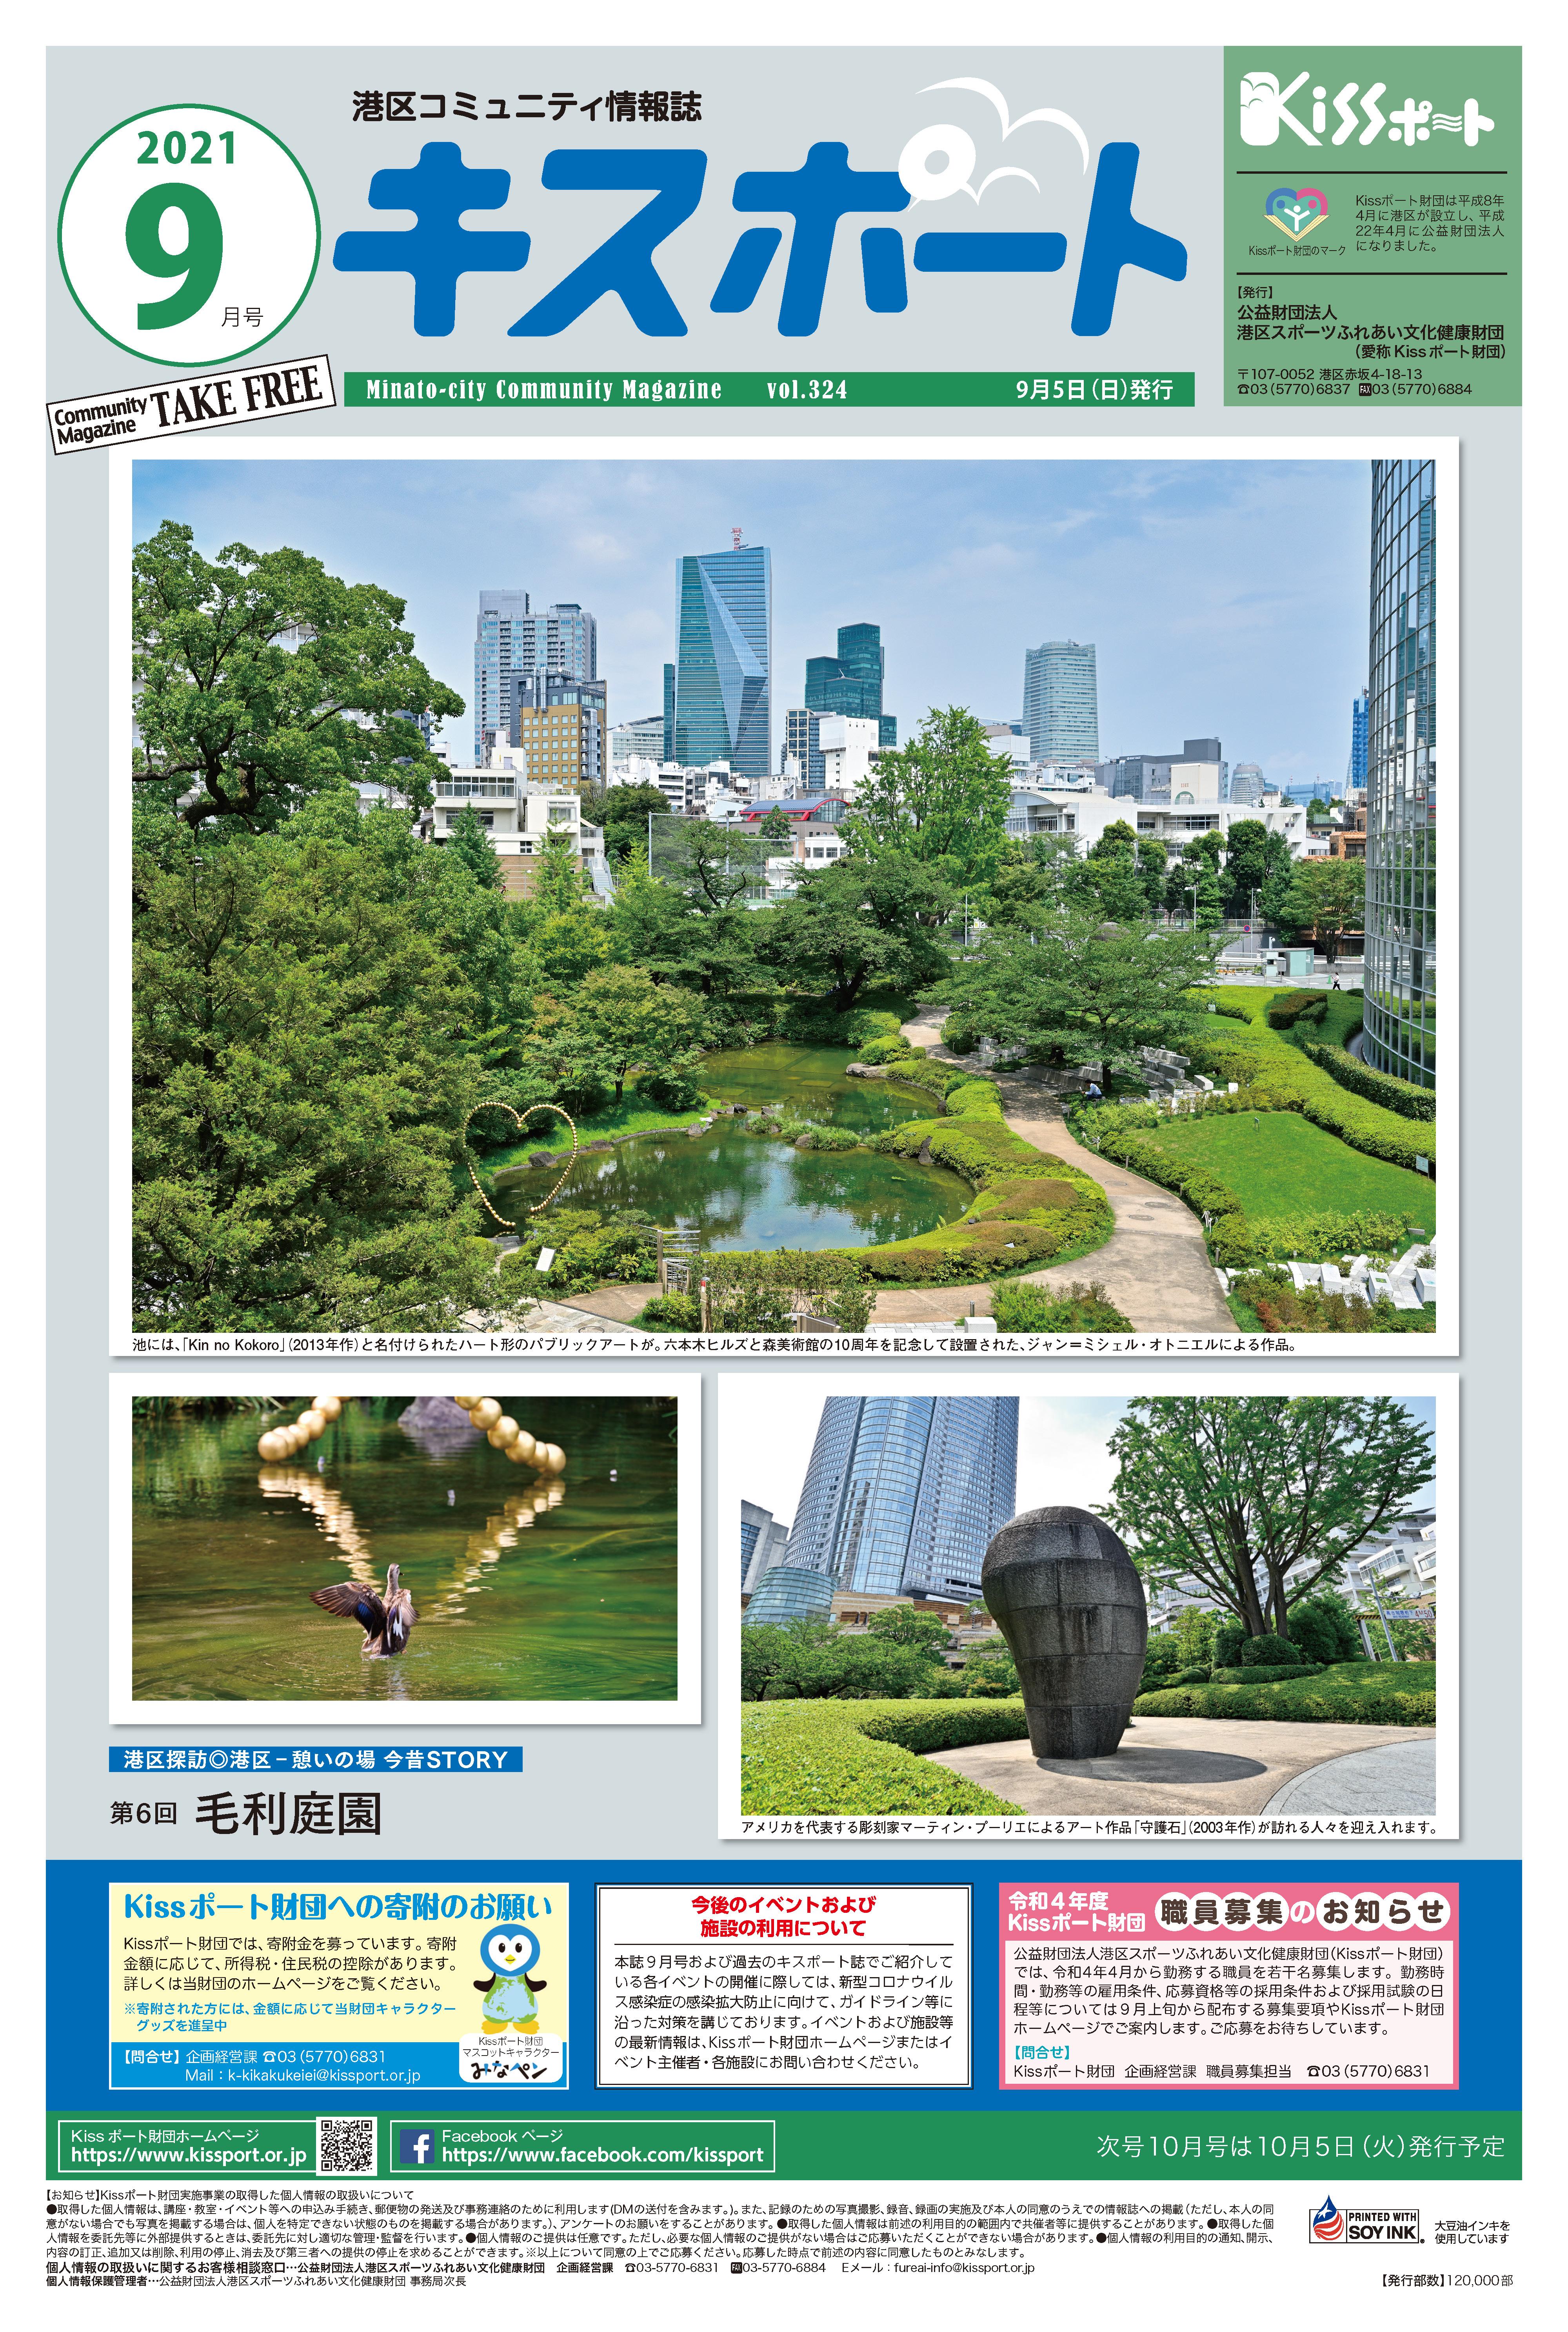 KISSポート2021年9月号表紙イメージ